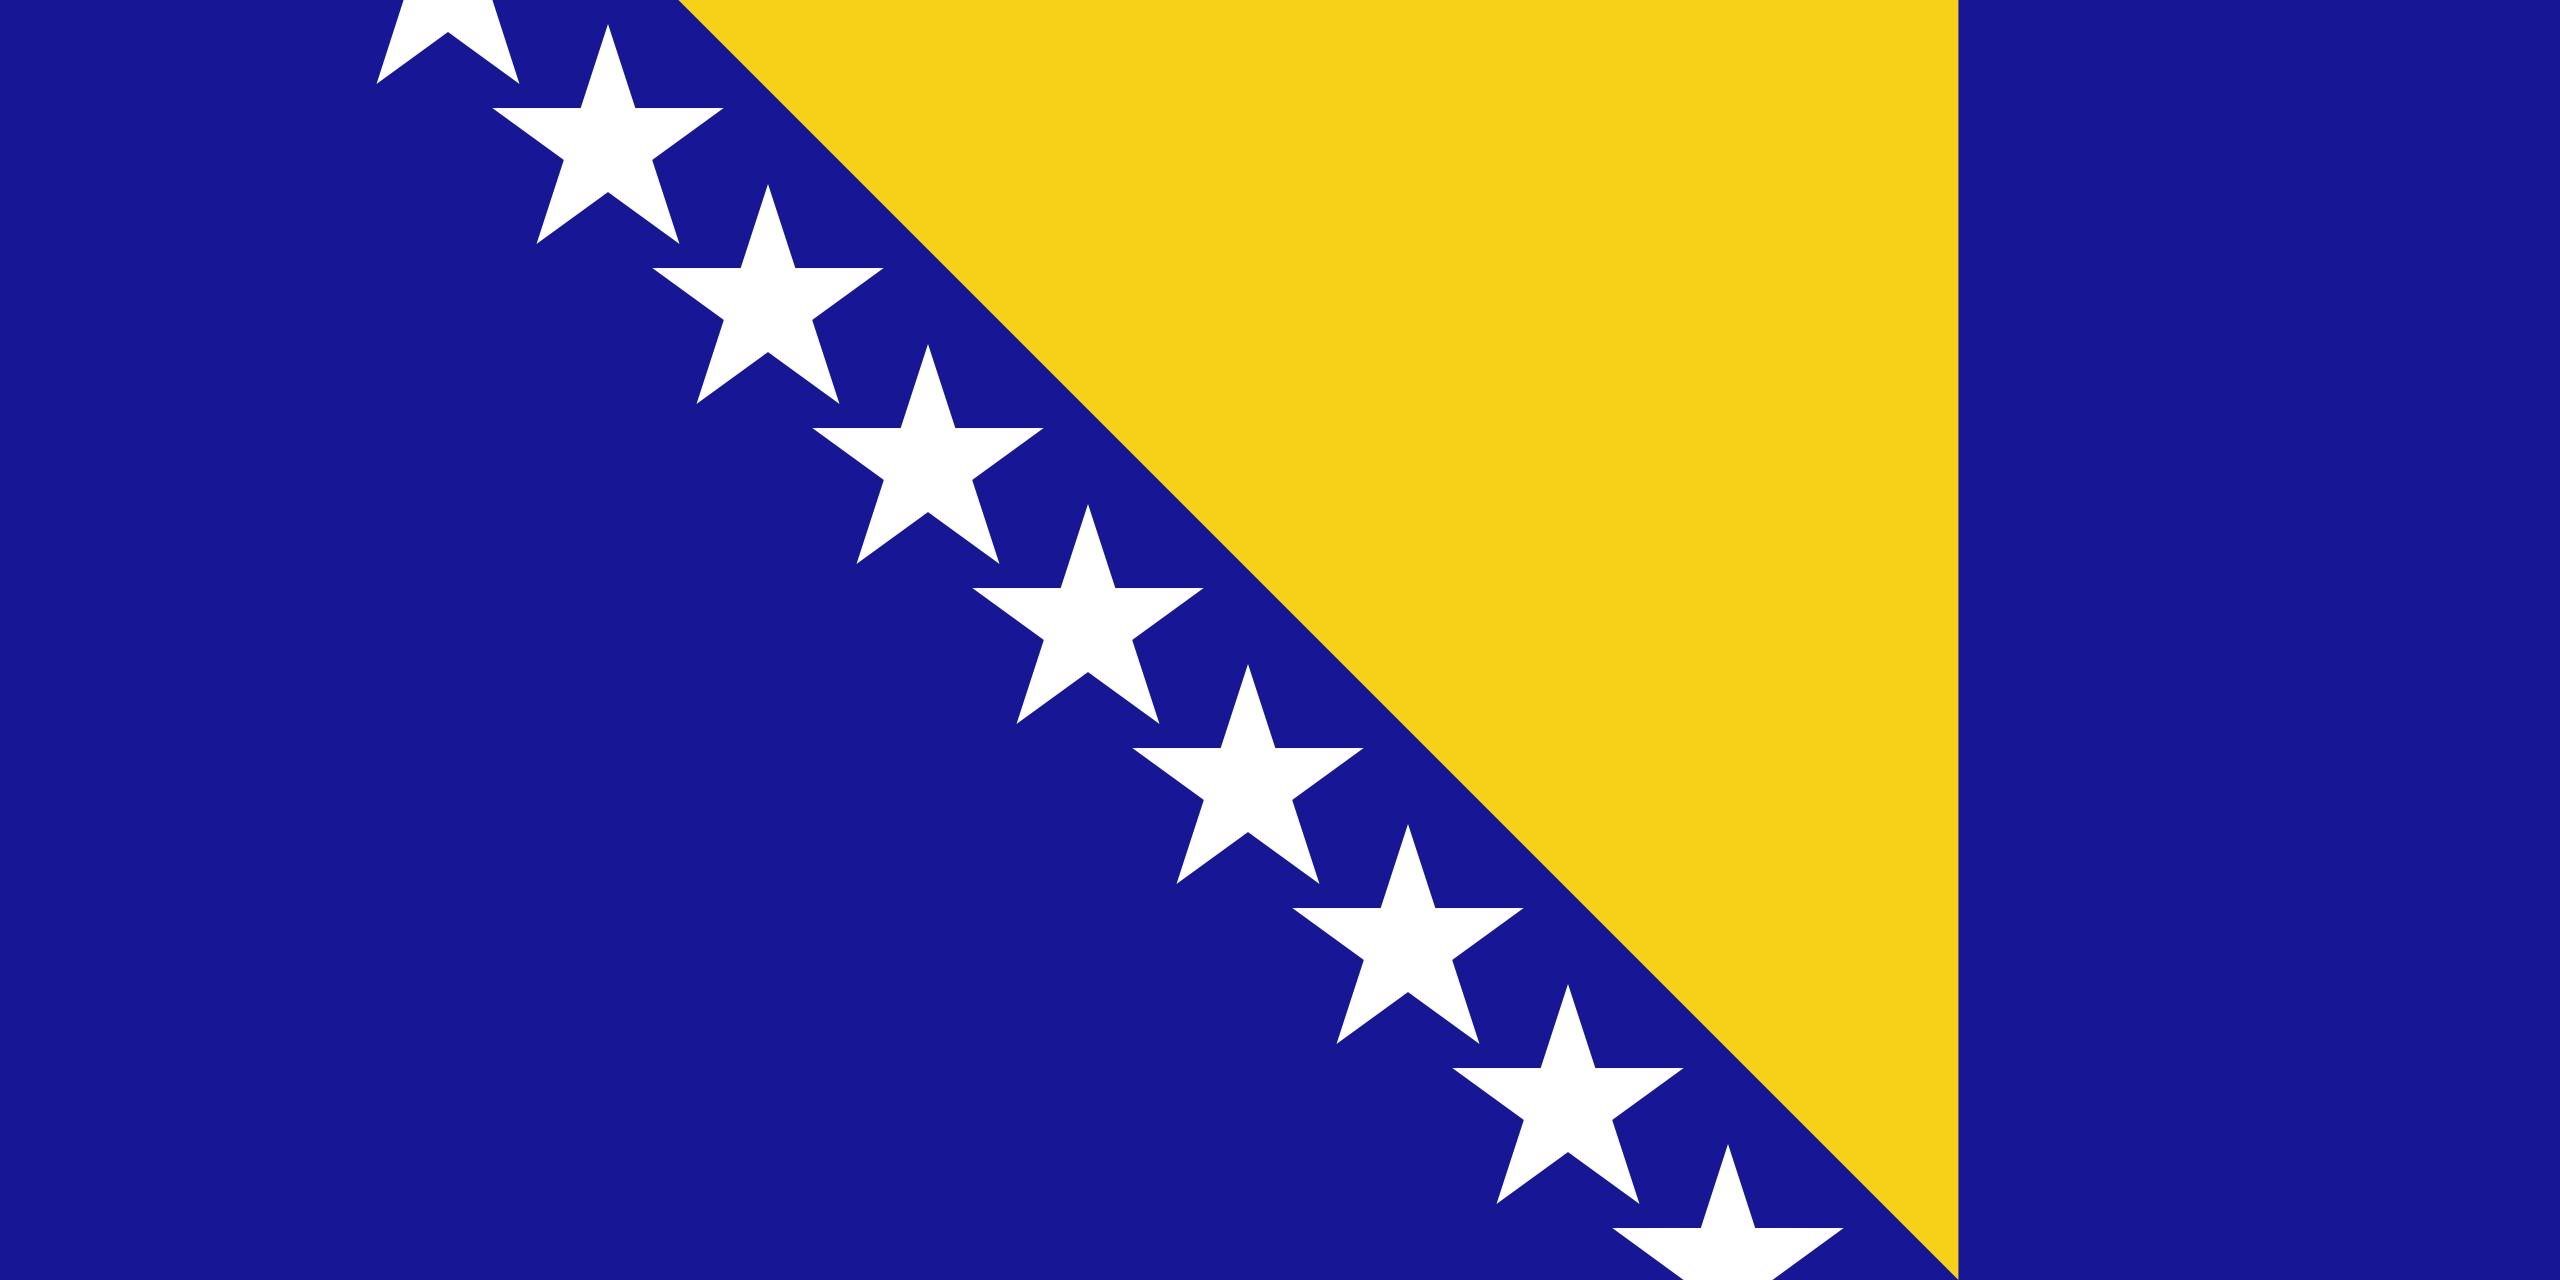 bosnia y herzegovina, paese, emblema, logo, simbolo - Sfondi HD - Professor-falken.com